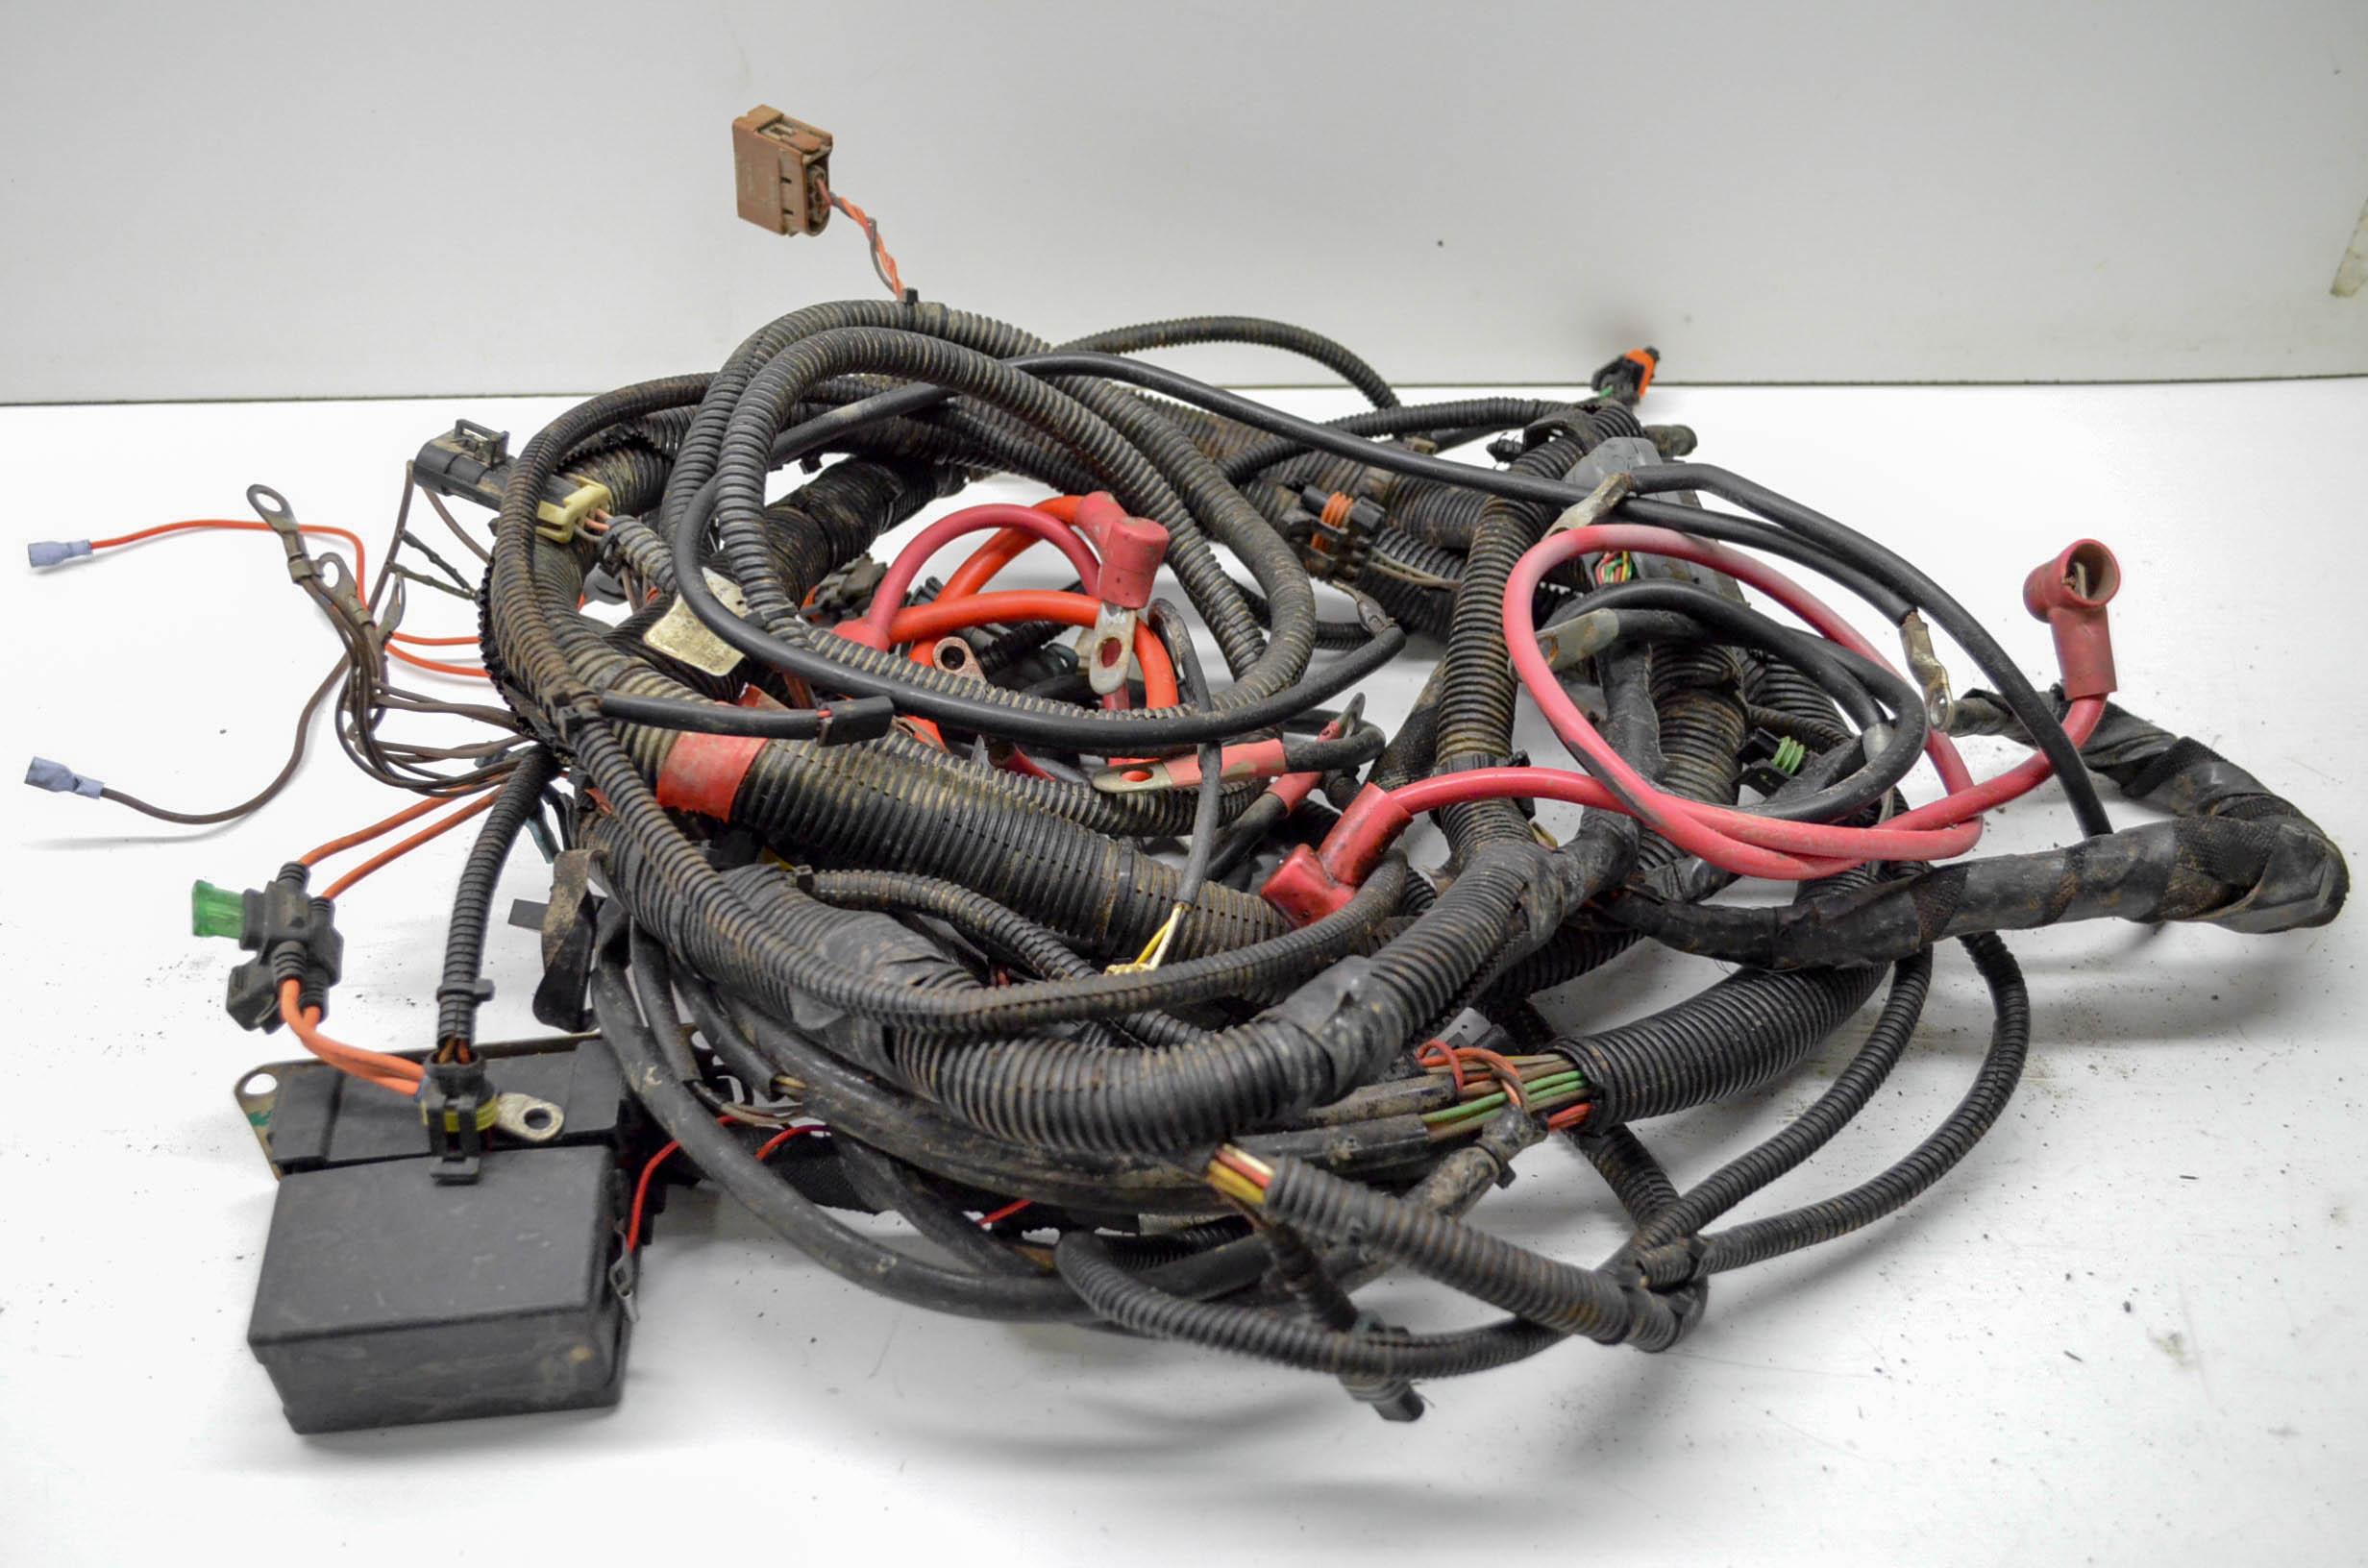 09 Polaris Rzr 800 Wire Harness Electrical Wiring